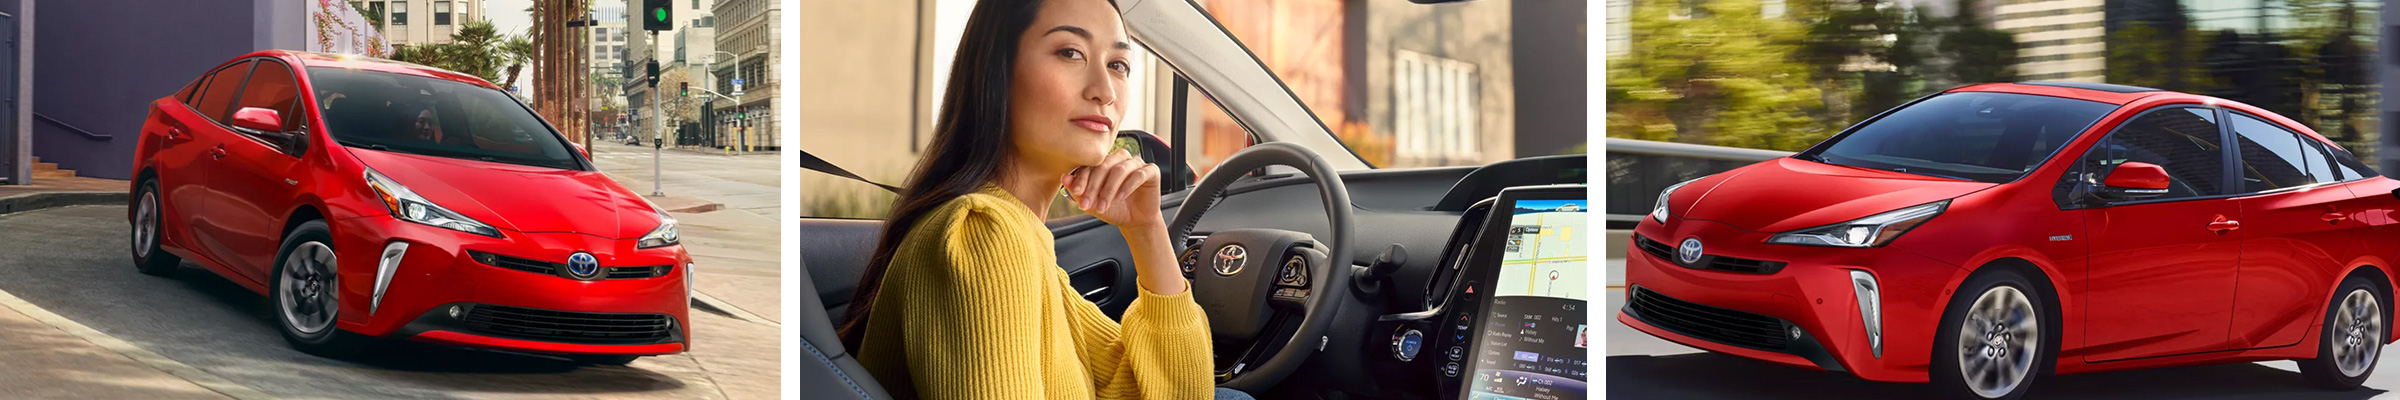 2022 Toyota Prius For Sale Savannah GA | Chatham County